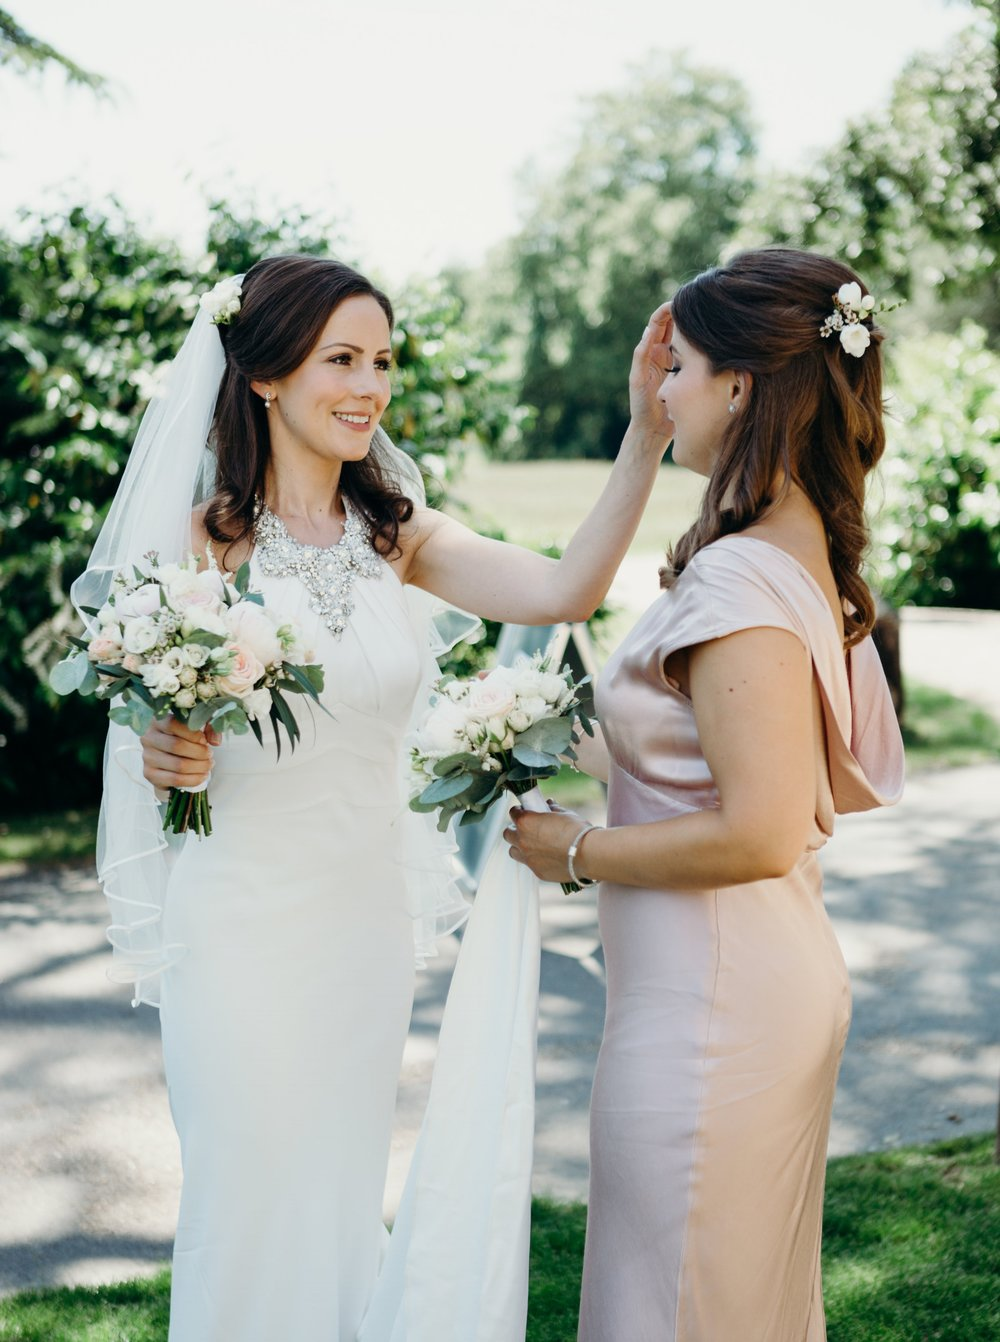 Beau-And-Anant-Wedding-Photographs-280.jpg